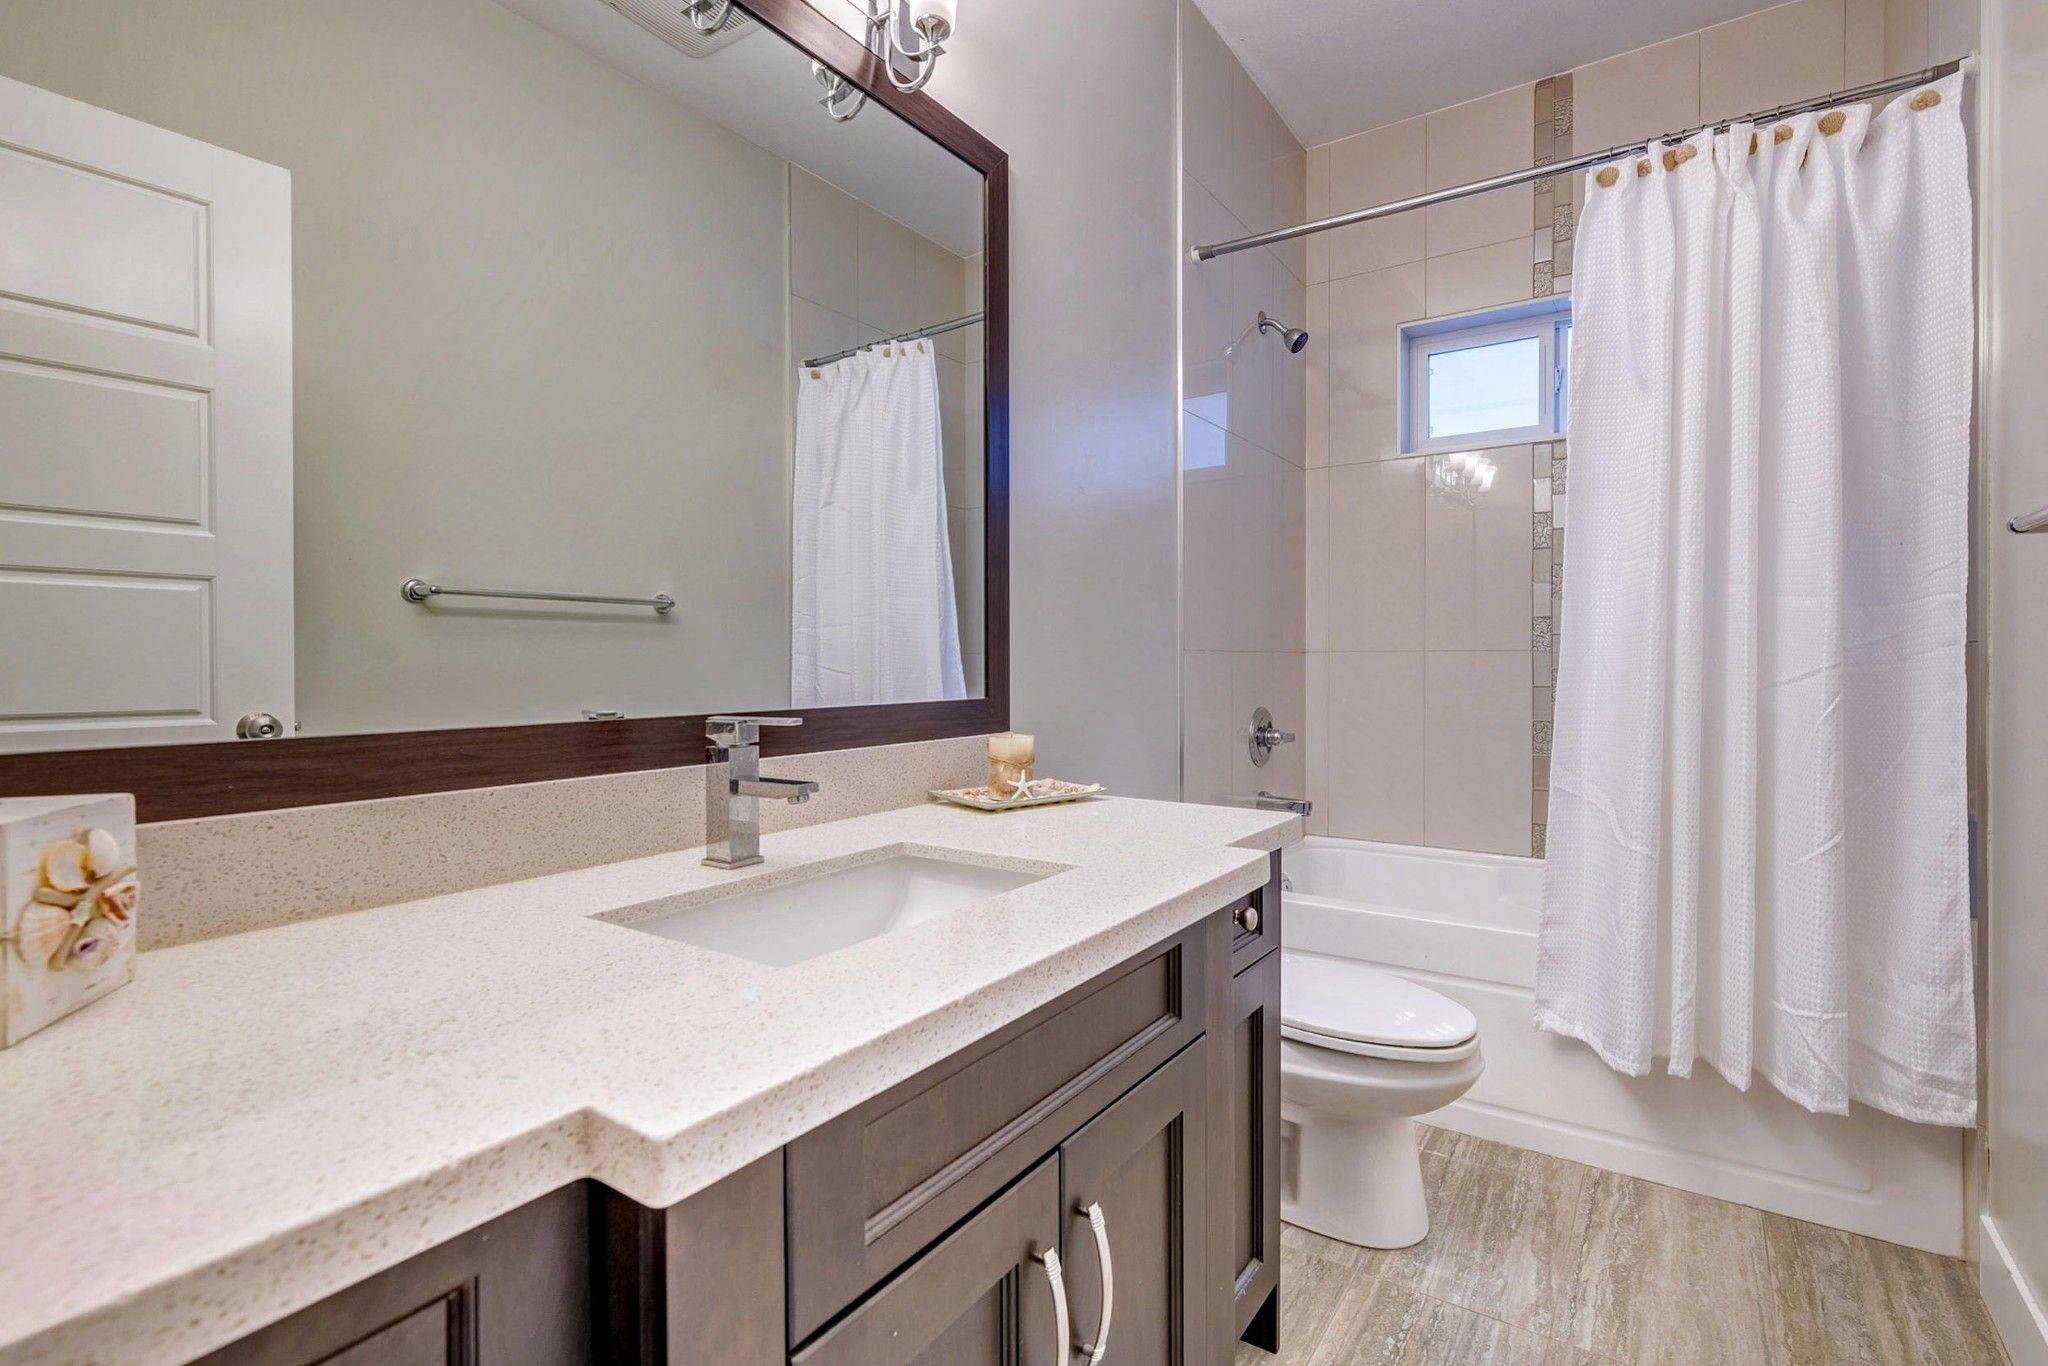 Photo 14: Photos: 1303 Hollybrook Street in Coquitlam: Burke Mountain House for sale : MLS®# R2423196